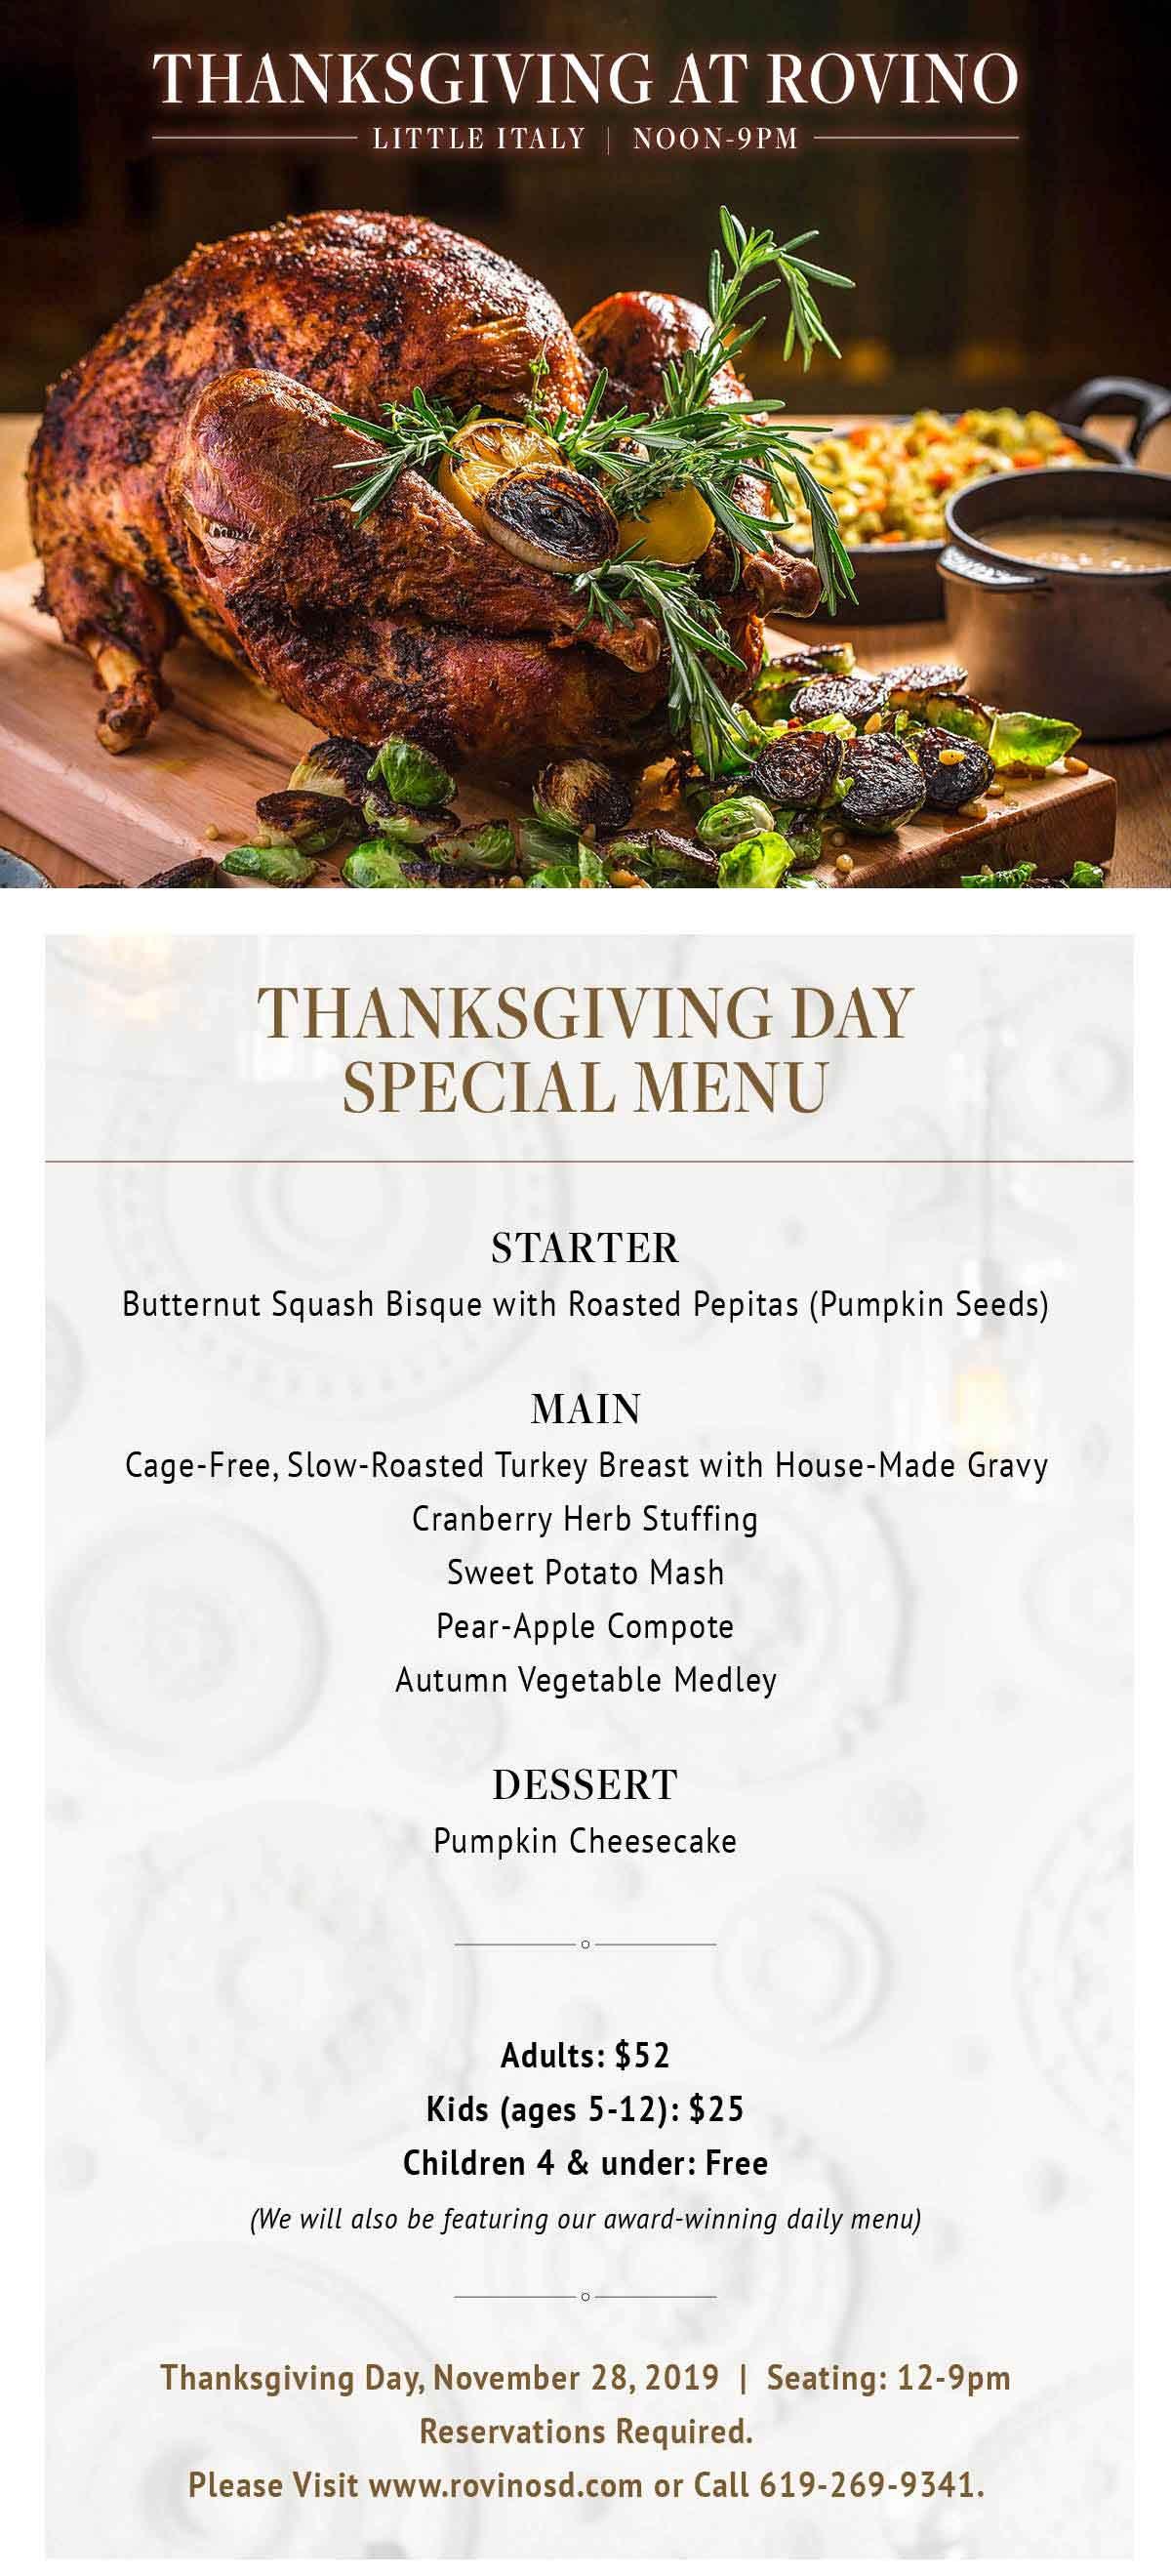 RoVino_Thanksgiving_Nov2019_Website_Crop